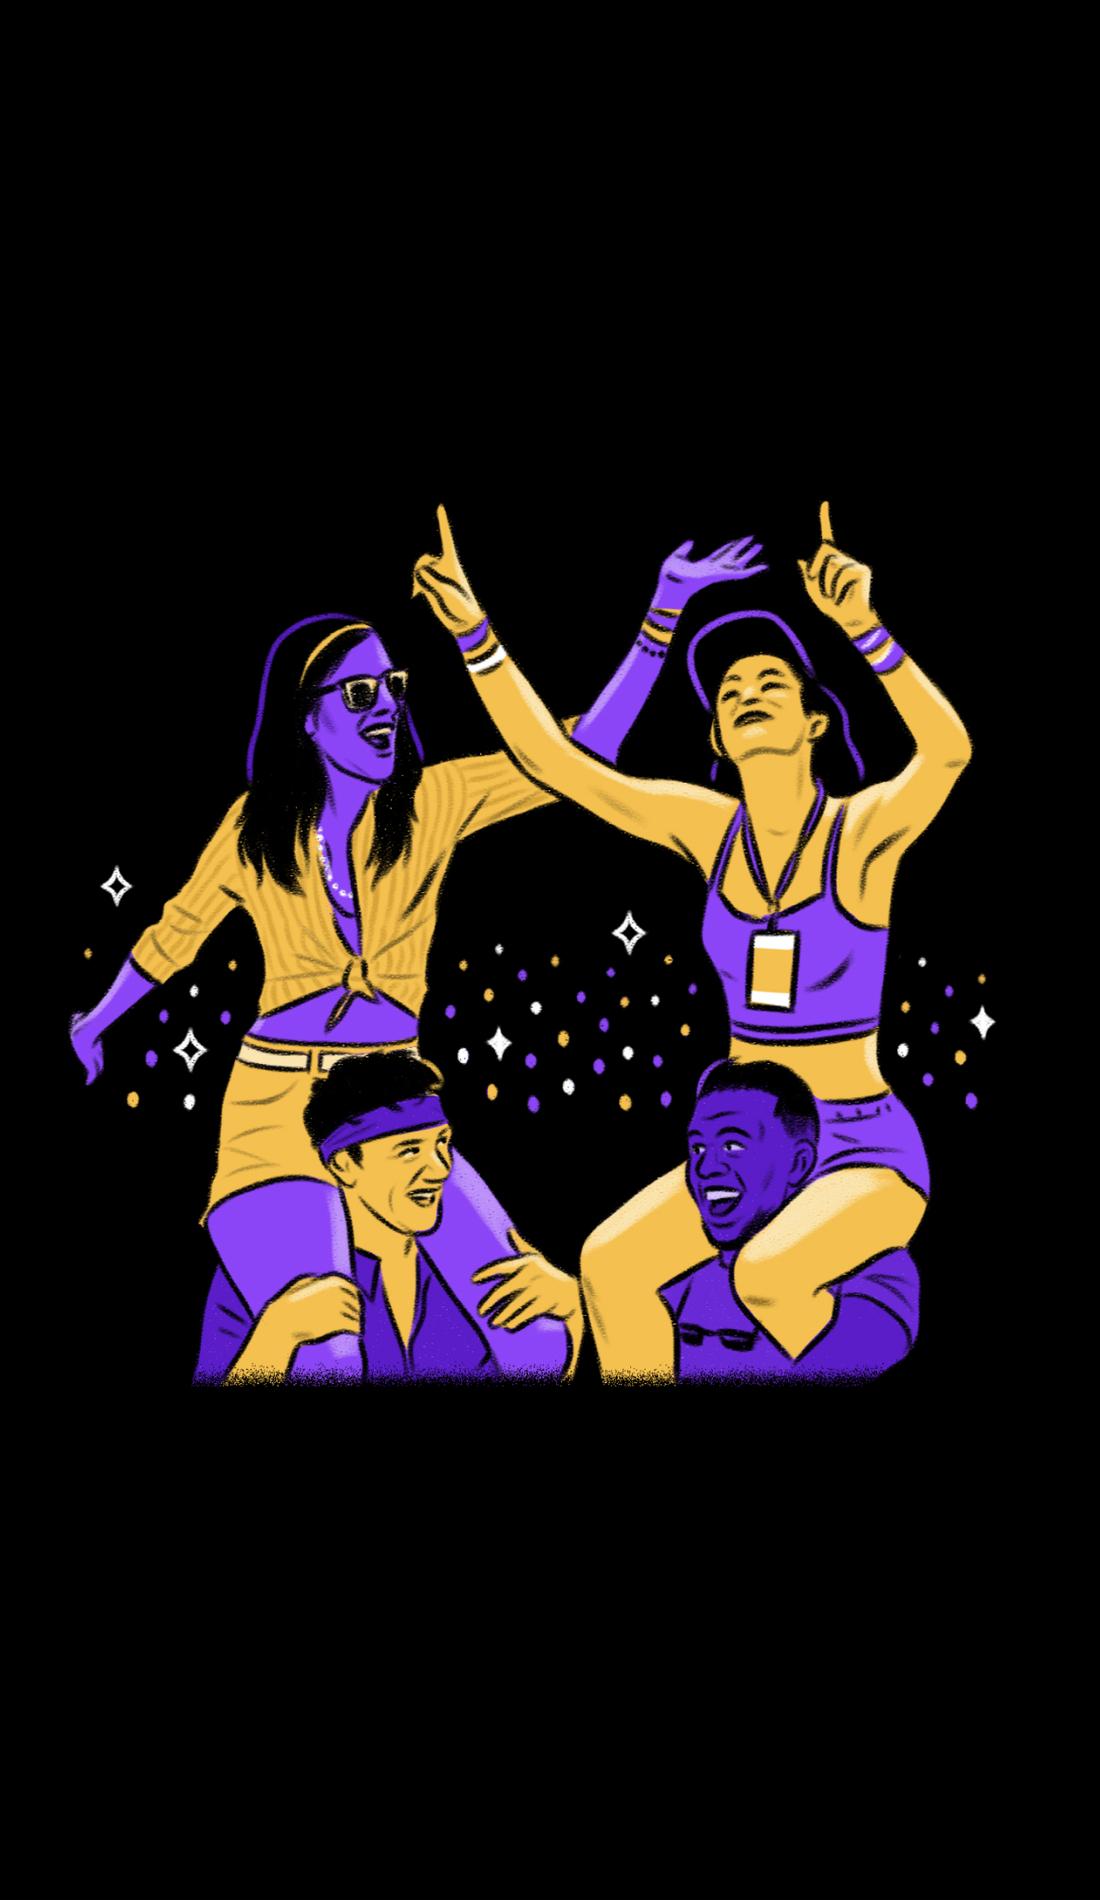 A Glastonbury Festival live event